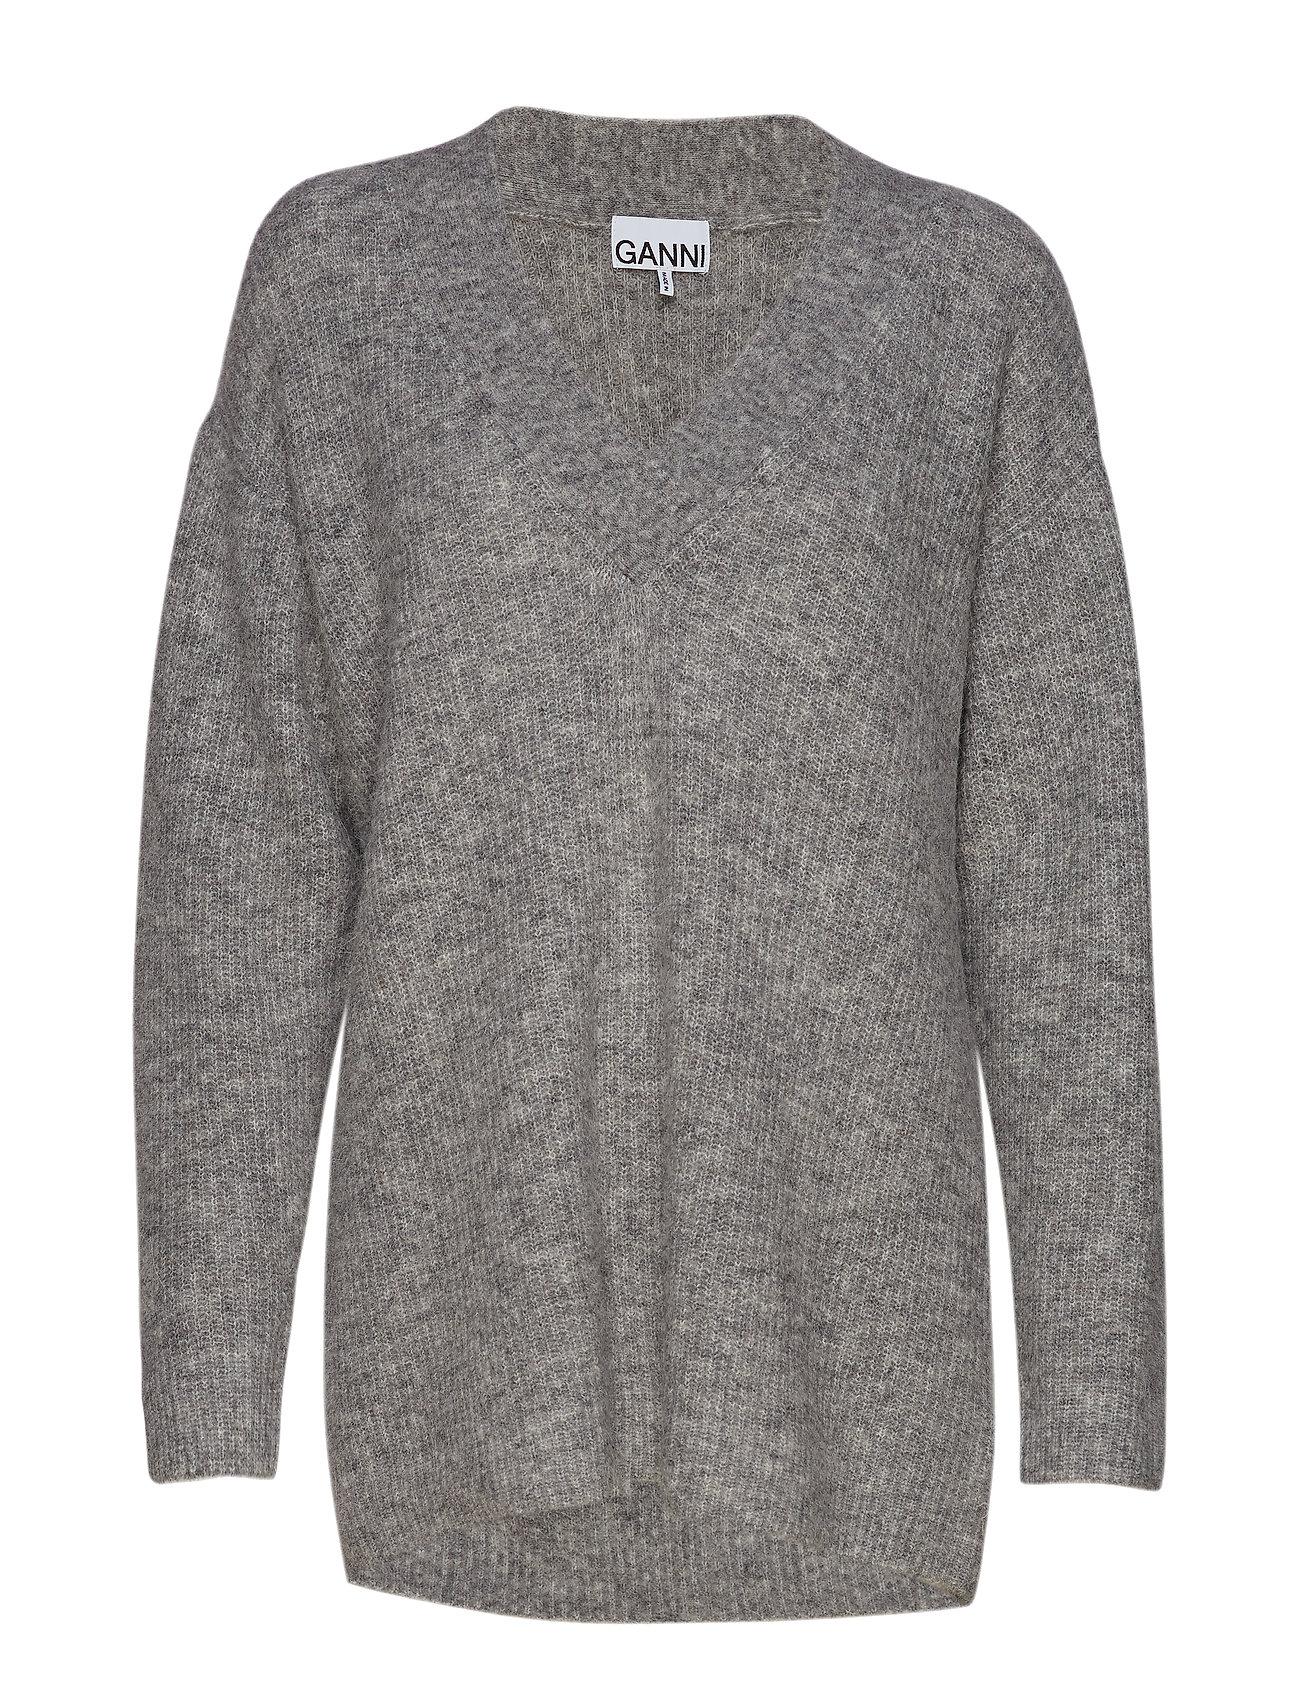 Ganni Soft Wool Knit - PALOMA MELANGE